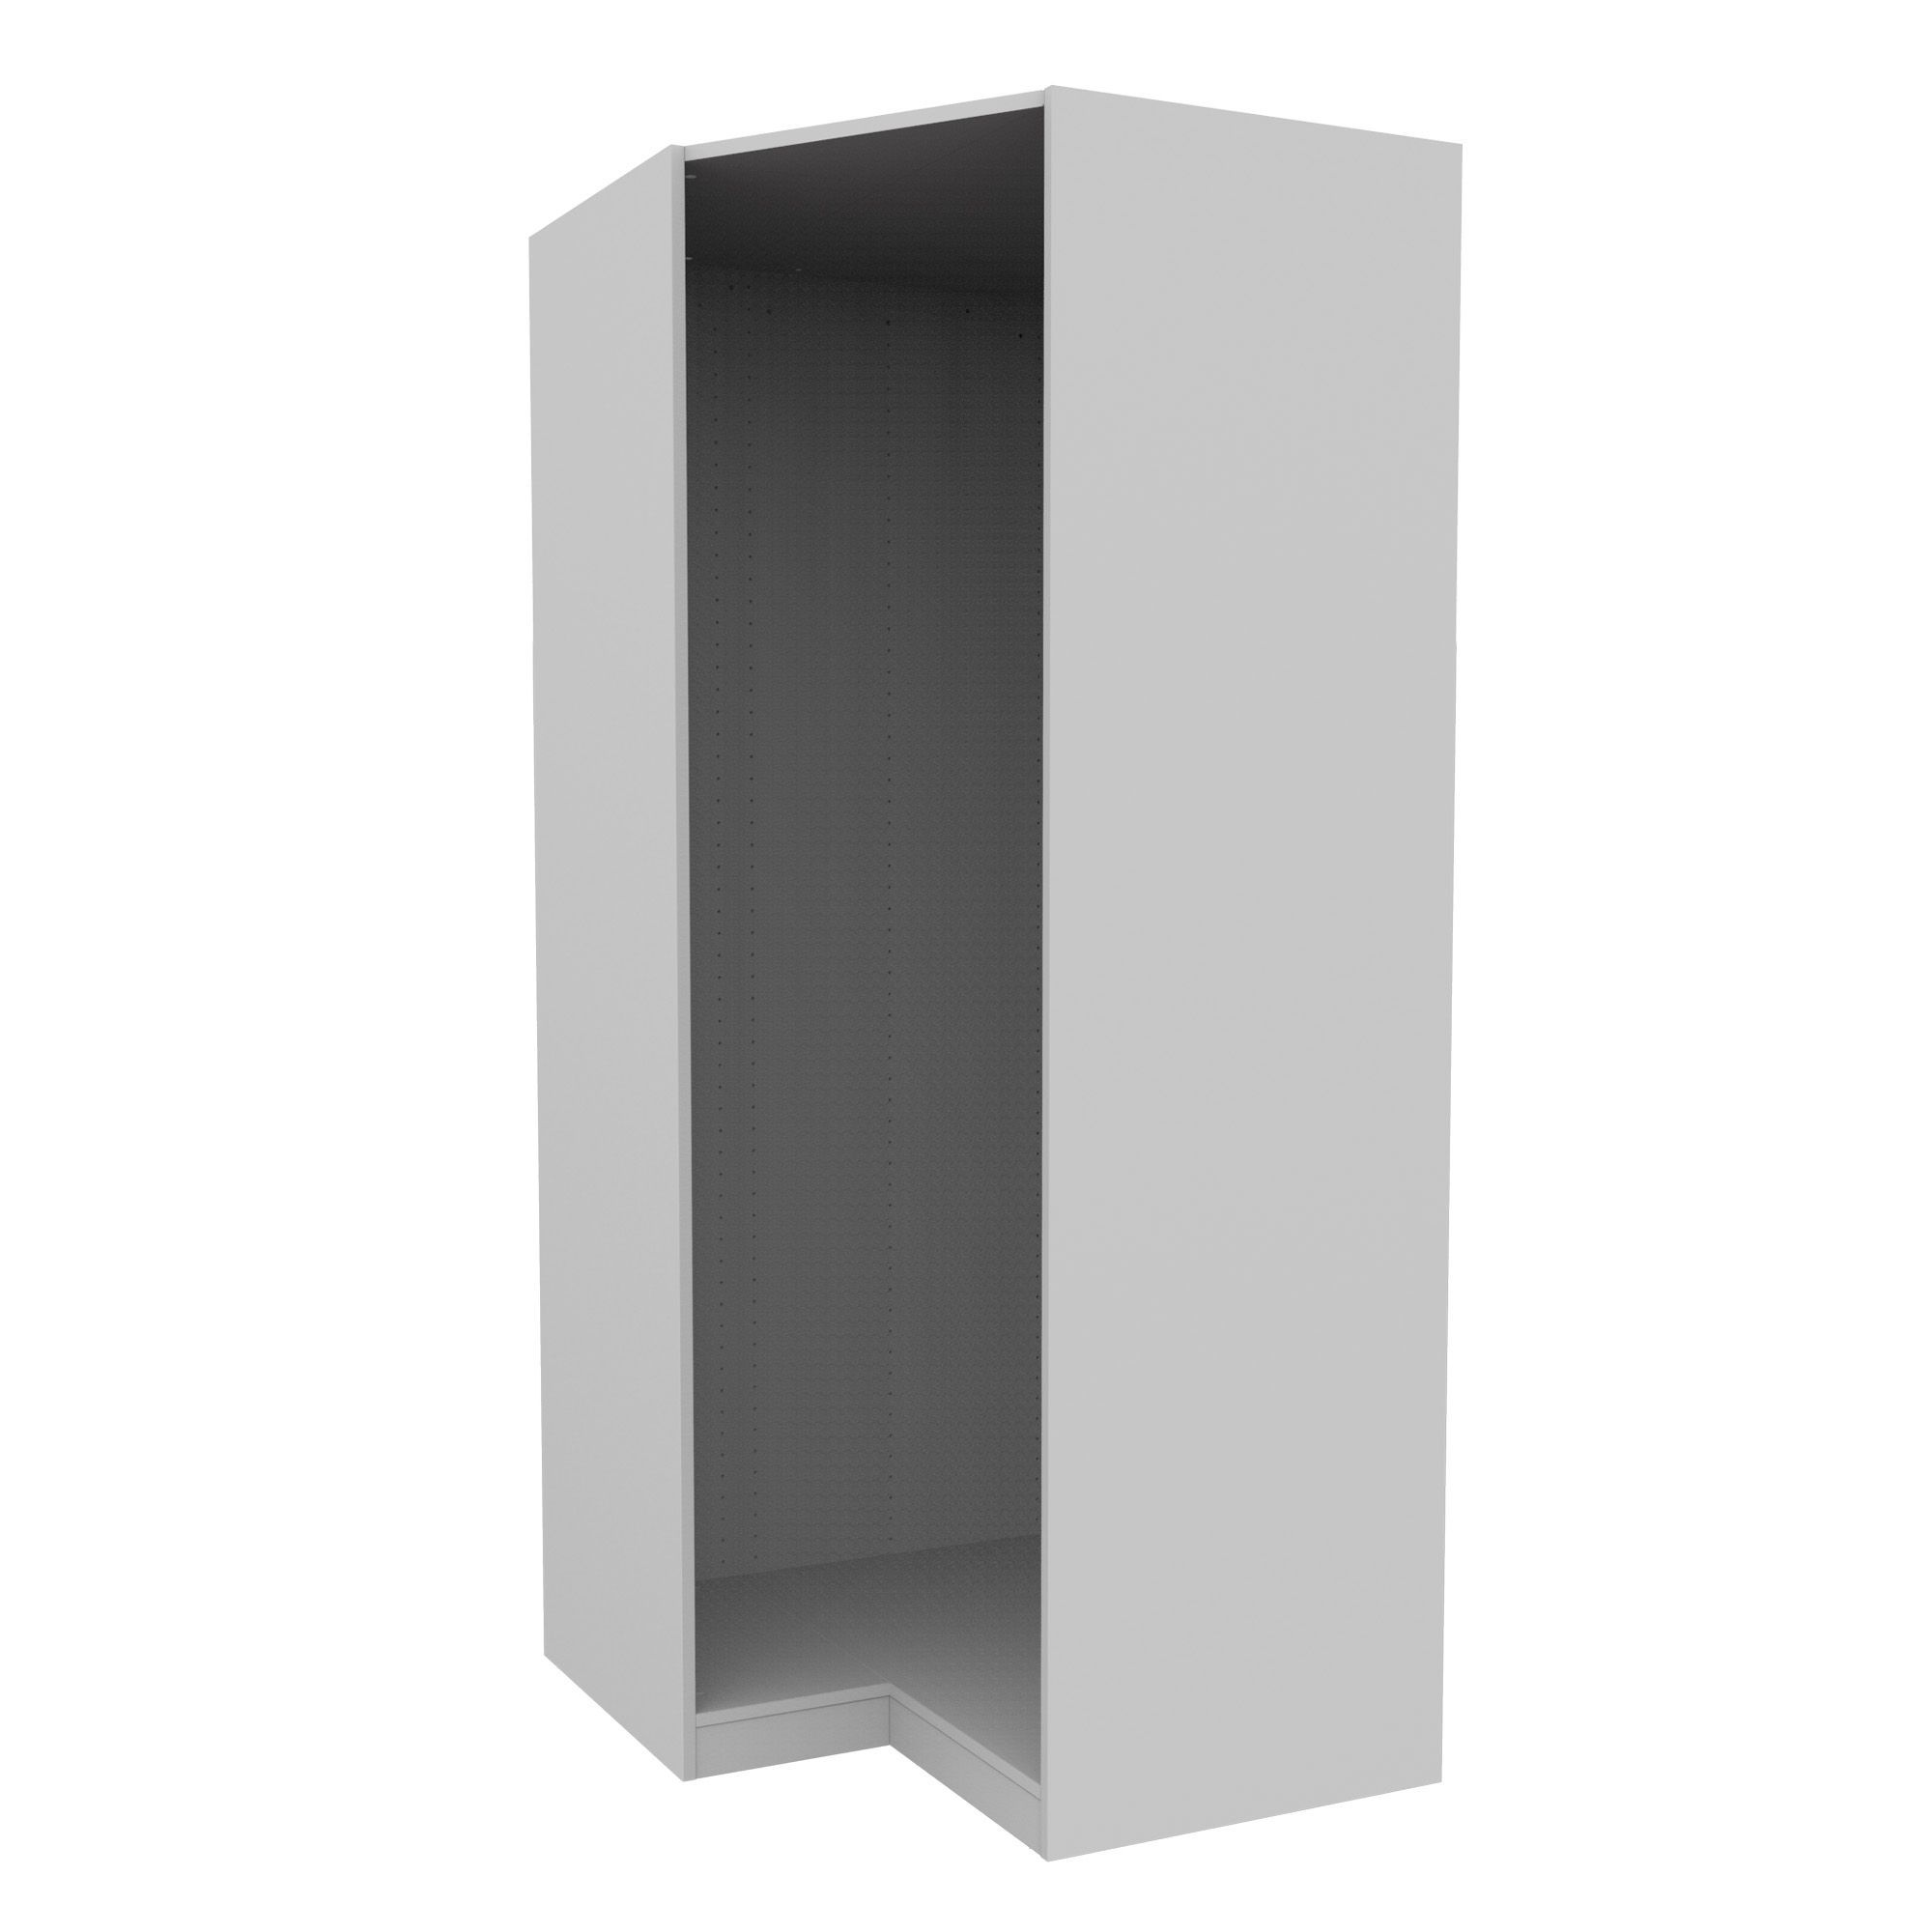 Darwin Modular White Corner Cabinet H2004mm W998mm D  : 366360204494901c from www.diy.com size 2000 x 2000 jpeg 92kB